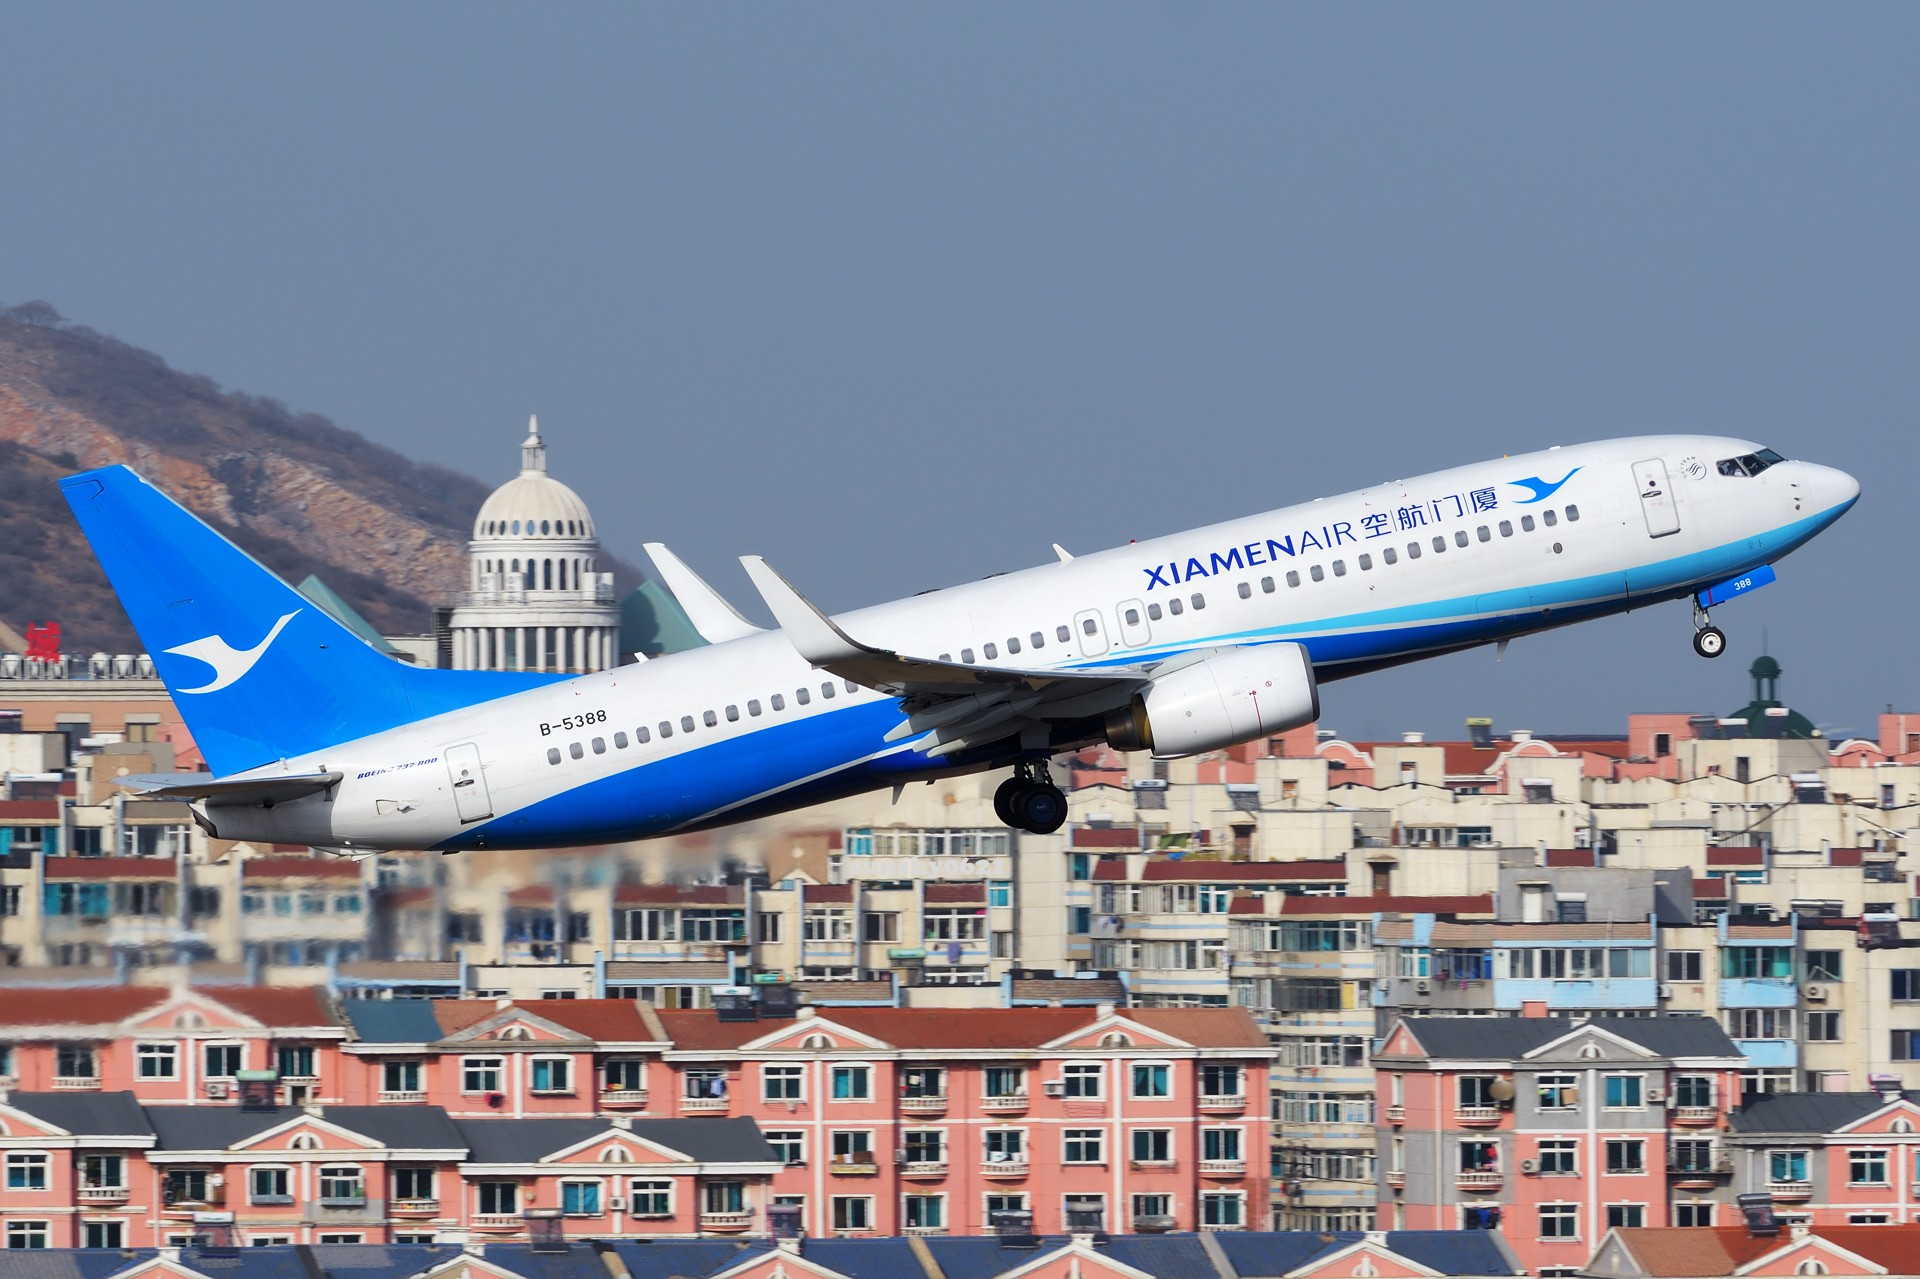 Re:[原创]★[DLC]2016年终总结(持续更新中)★ BOEING 737-800 B-5388 中国大连国际机场